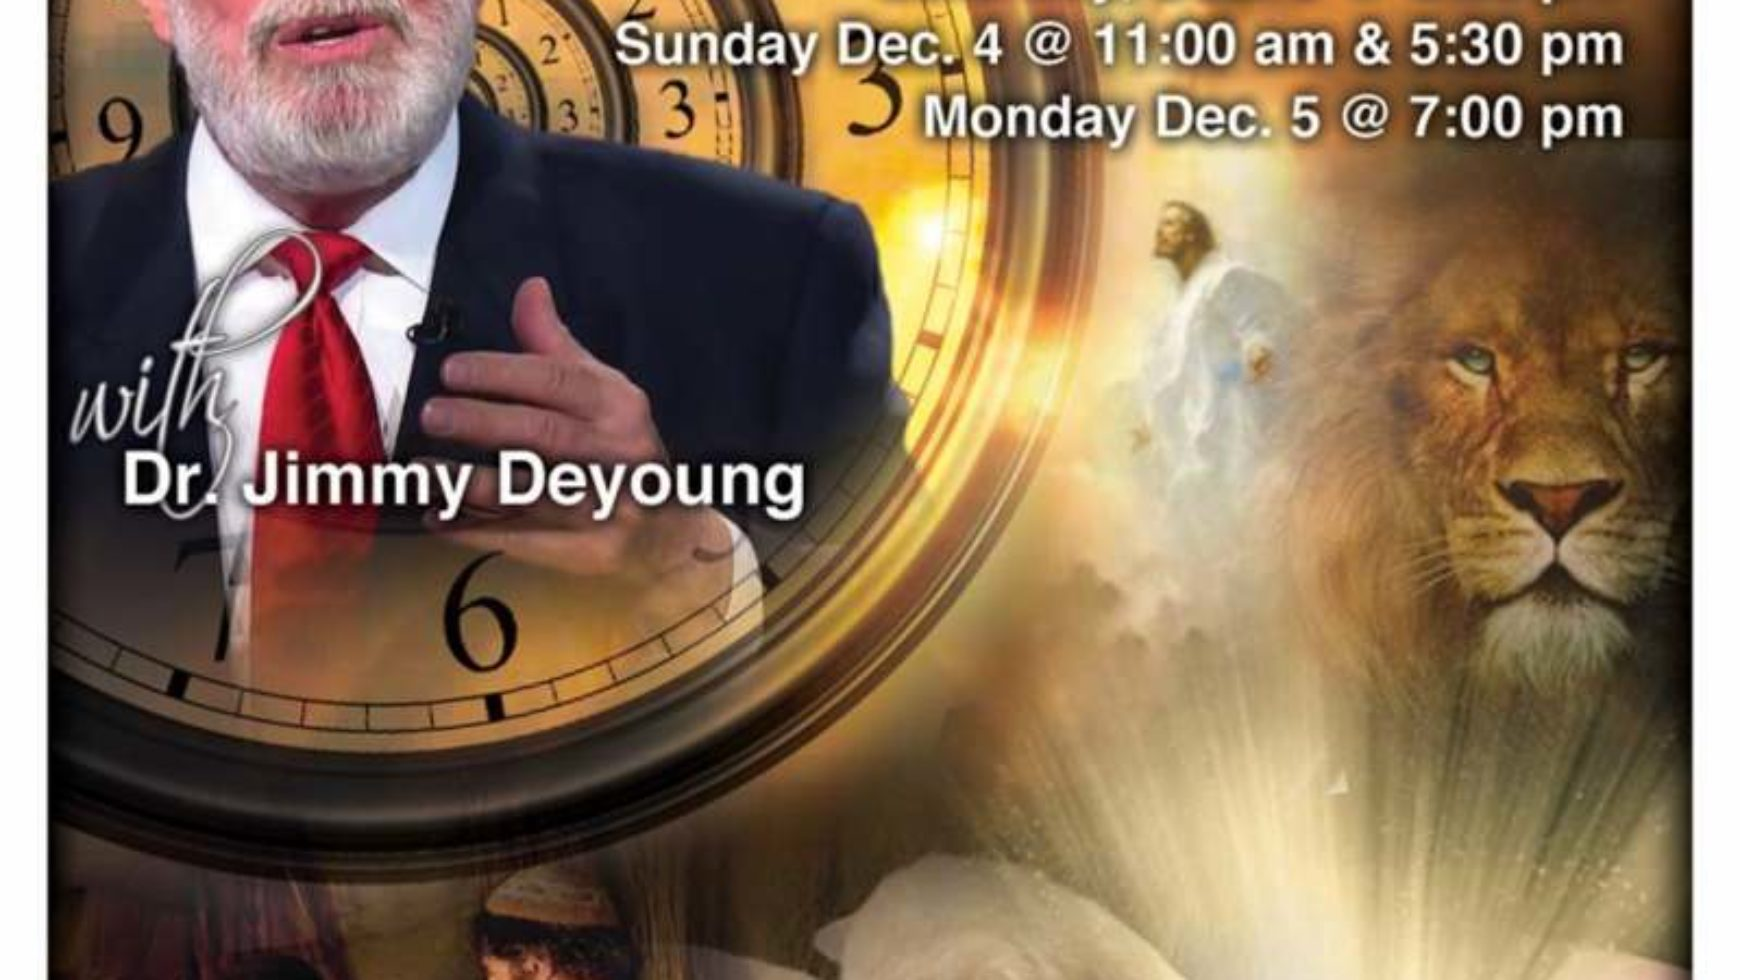 Area Meeting: Prophecy Conference – New Life Baptist Church – Dalton, Ga